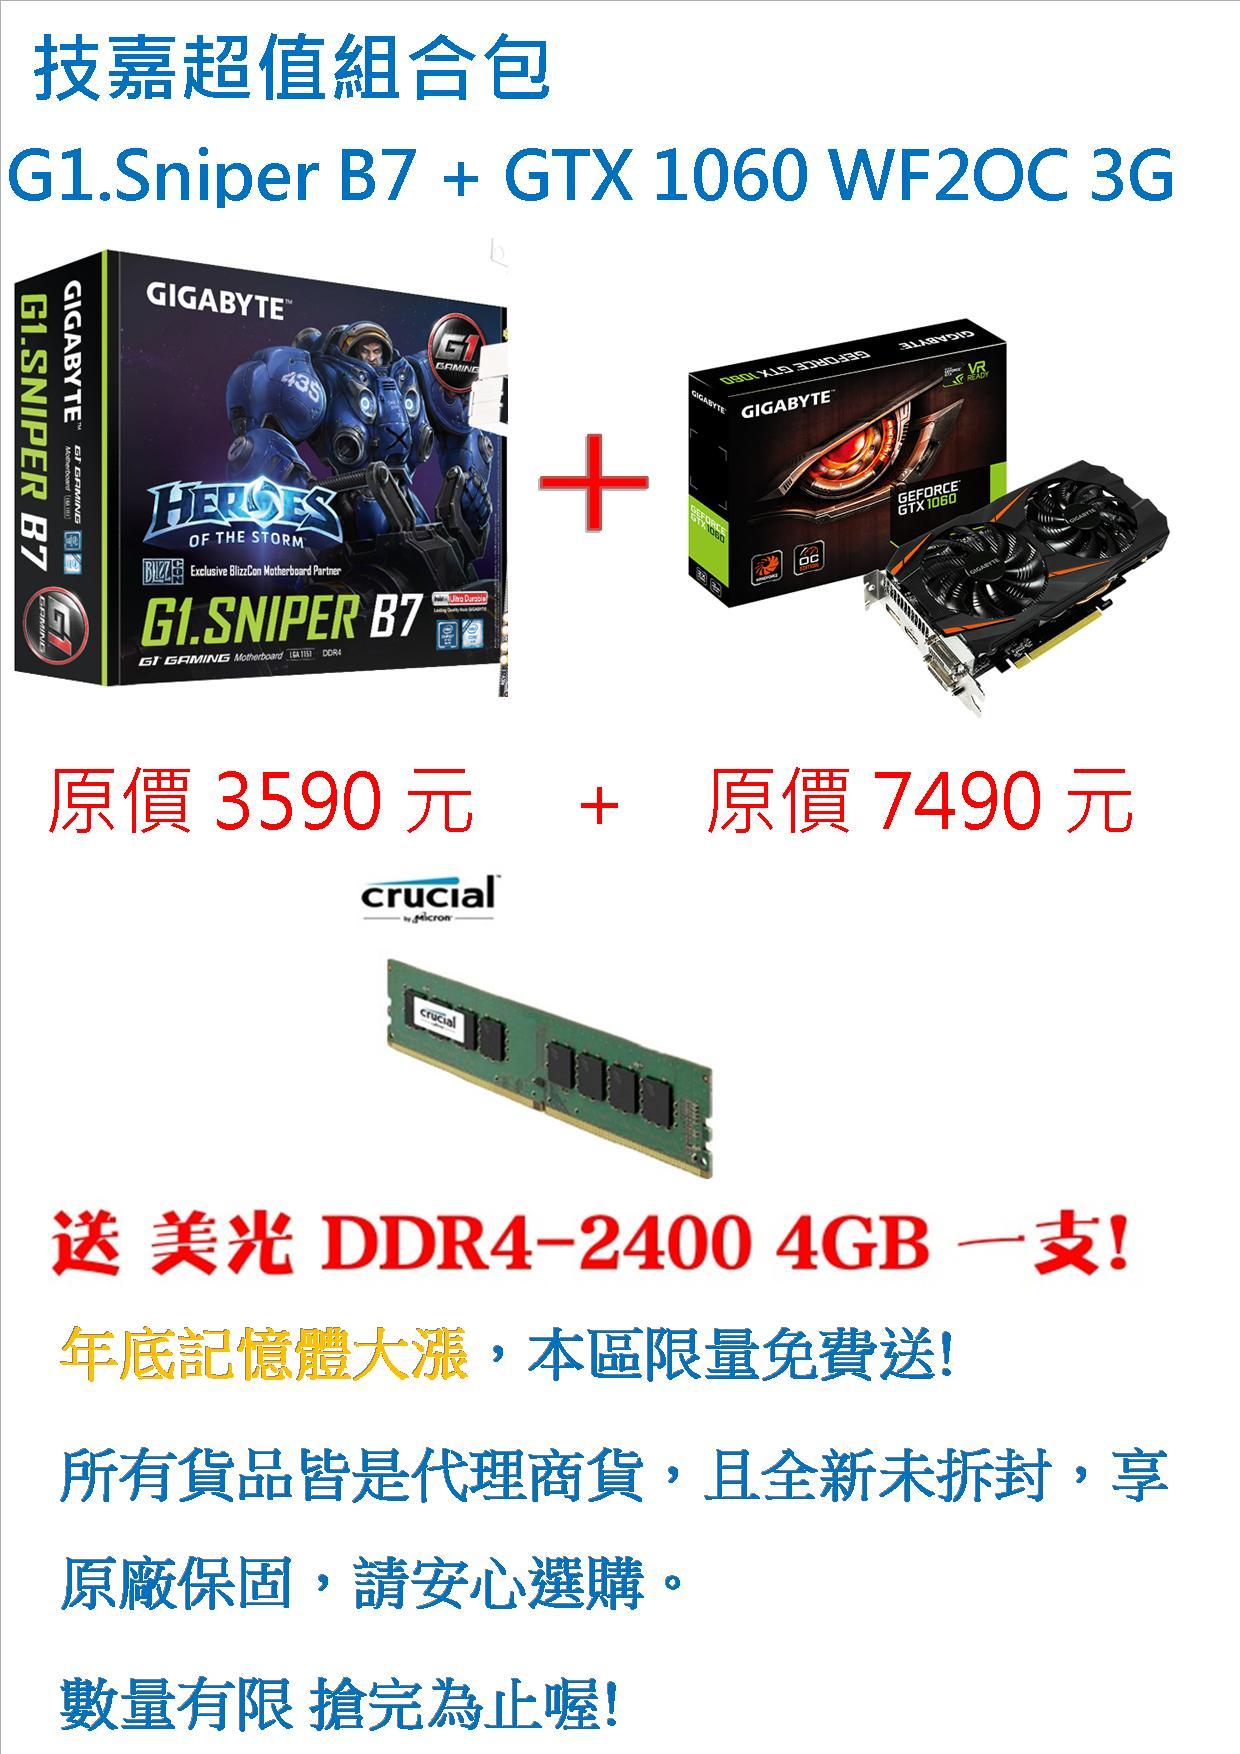 (送DDR4 4G ) 技嘉 G1.Sniper B7 + GTX 1060 3G GIGABYTE 主機板